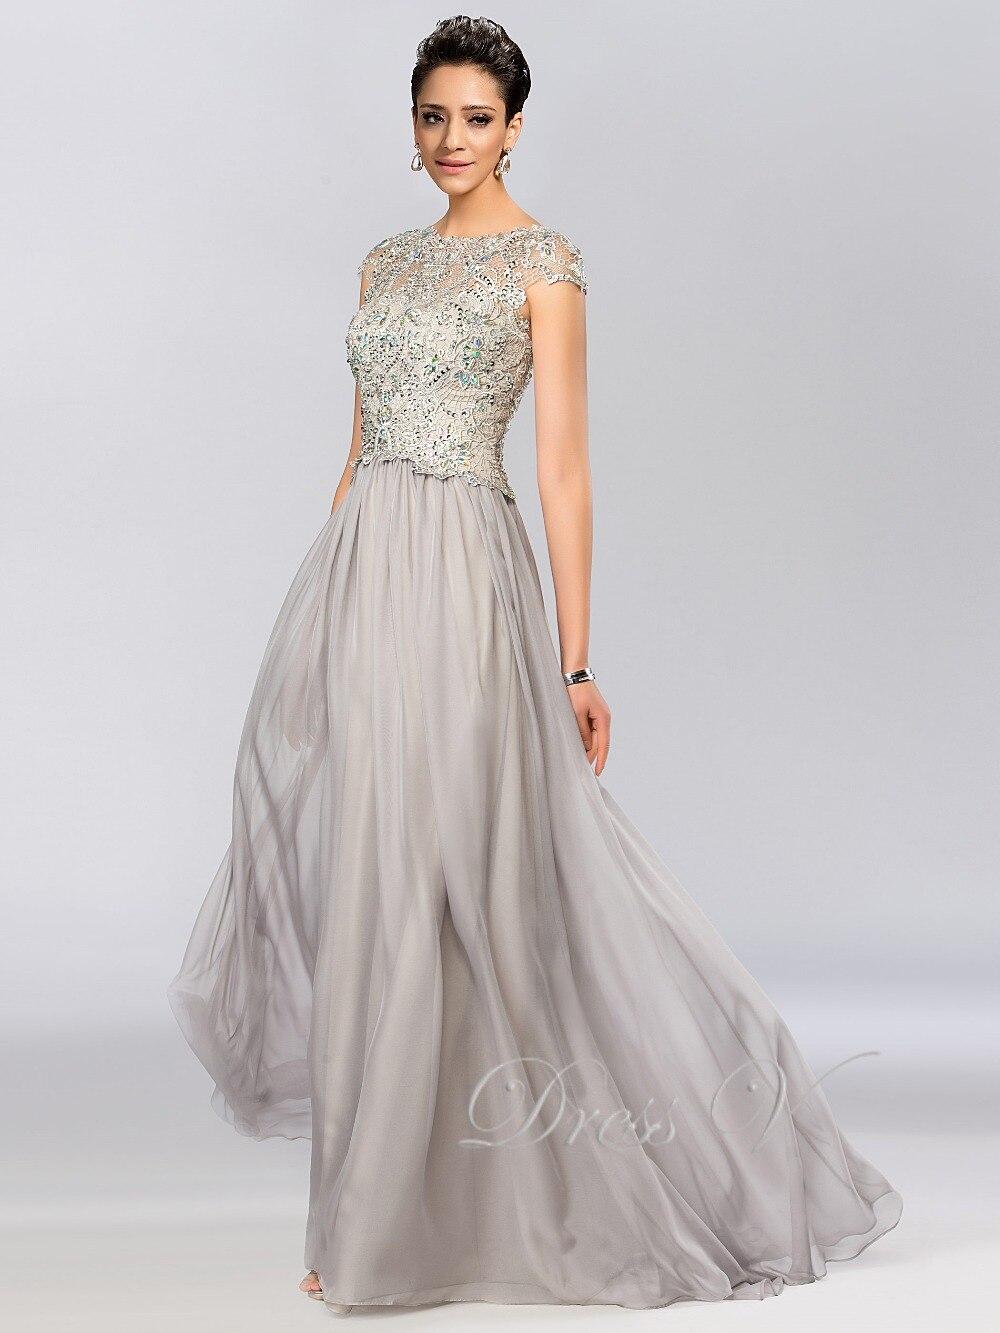 Grey Lace Prom Dresses 2017 – fashion dresses c44d802df680